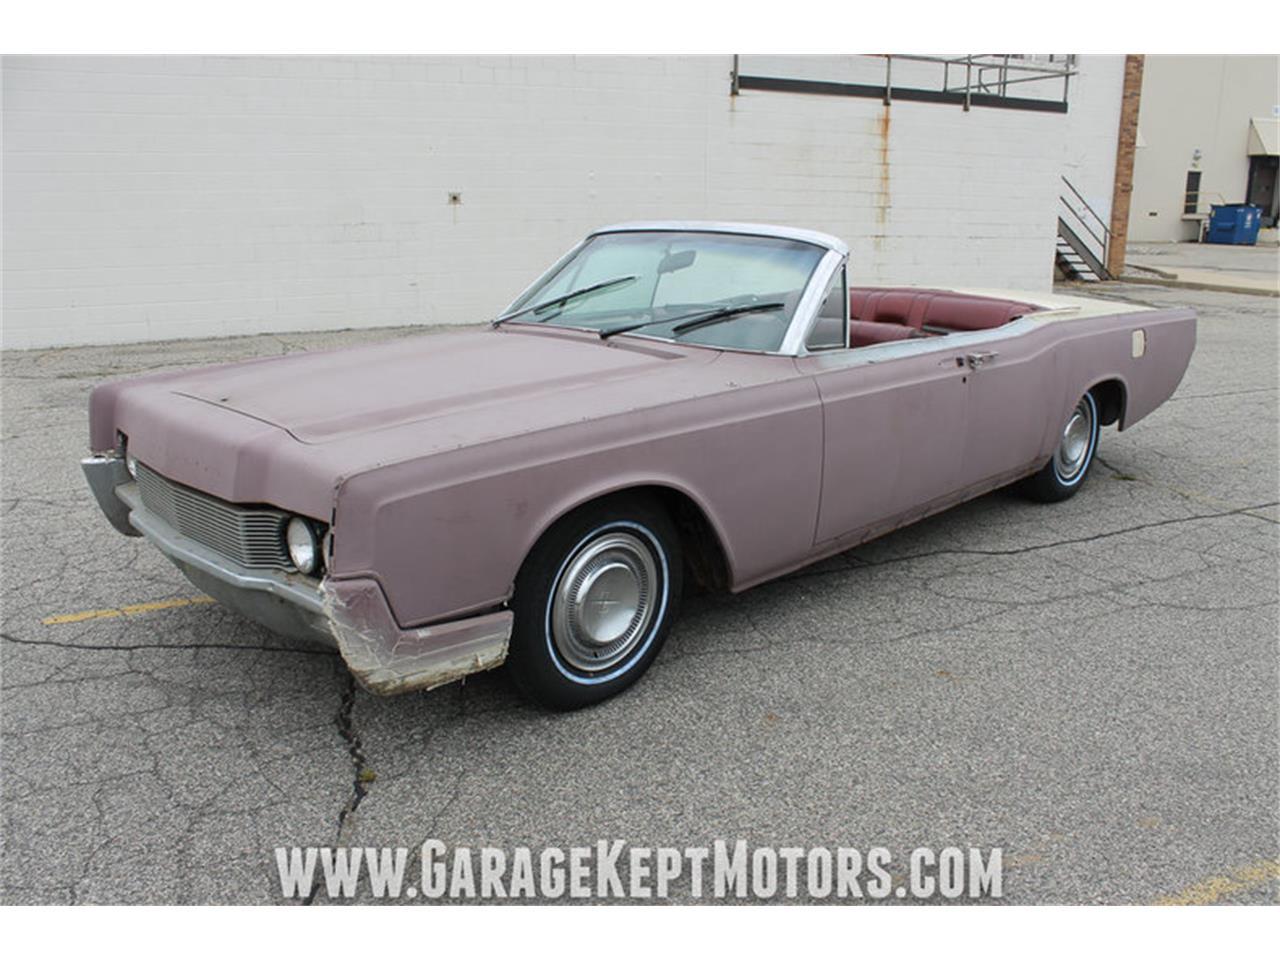 4 Door Convertible >> 1967 Lincoln Continental 4 Door Convertible For Sale Classiccars